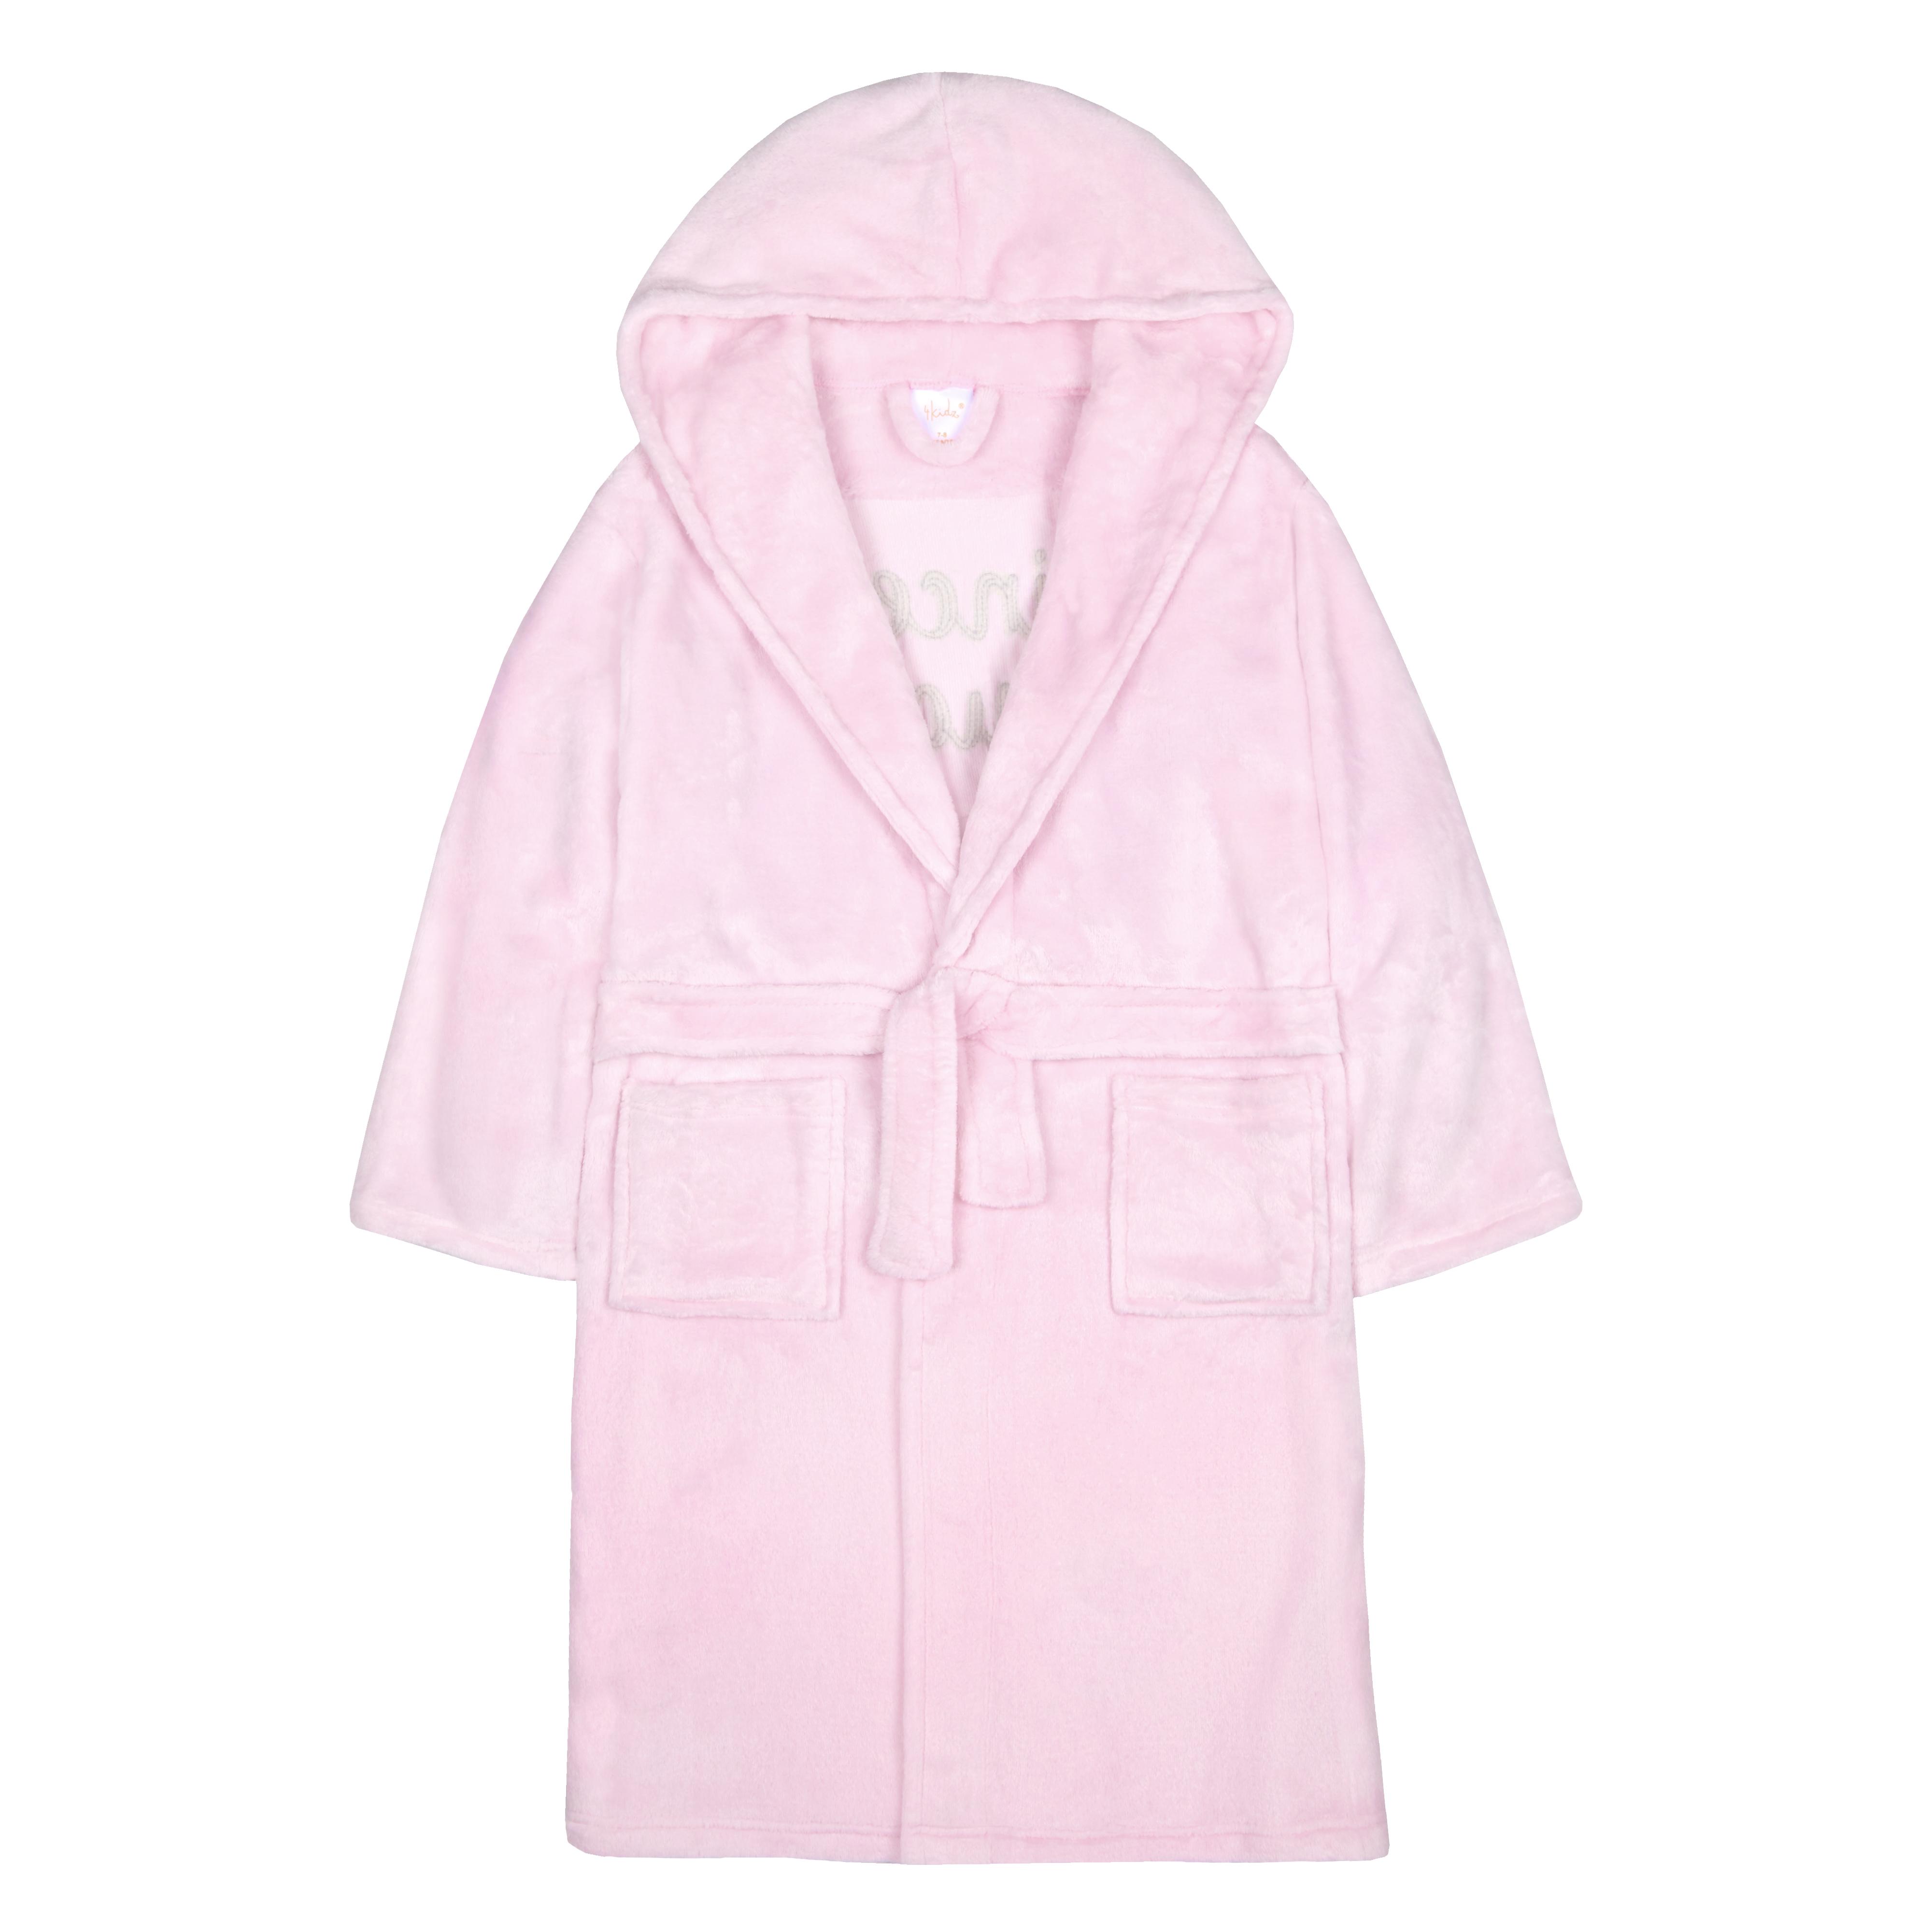 51b0aa9b02c Girls Children s Sequin Princess Plush Fleece Dressing Gown Robe Soft Hooded